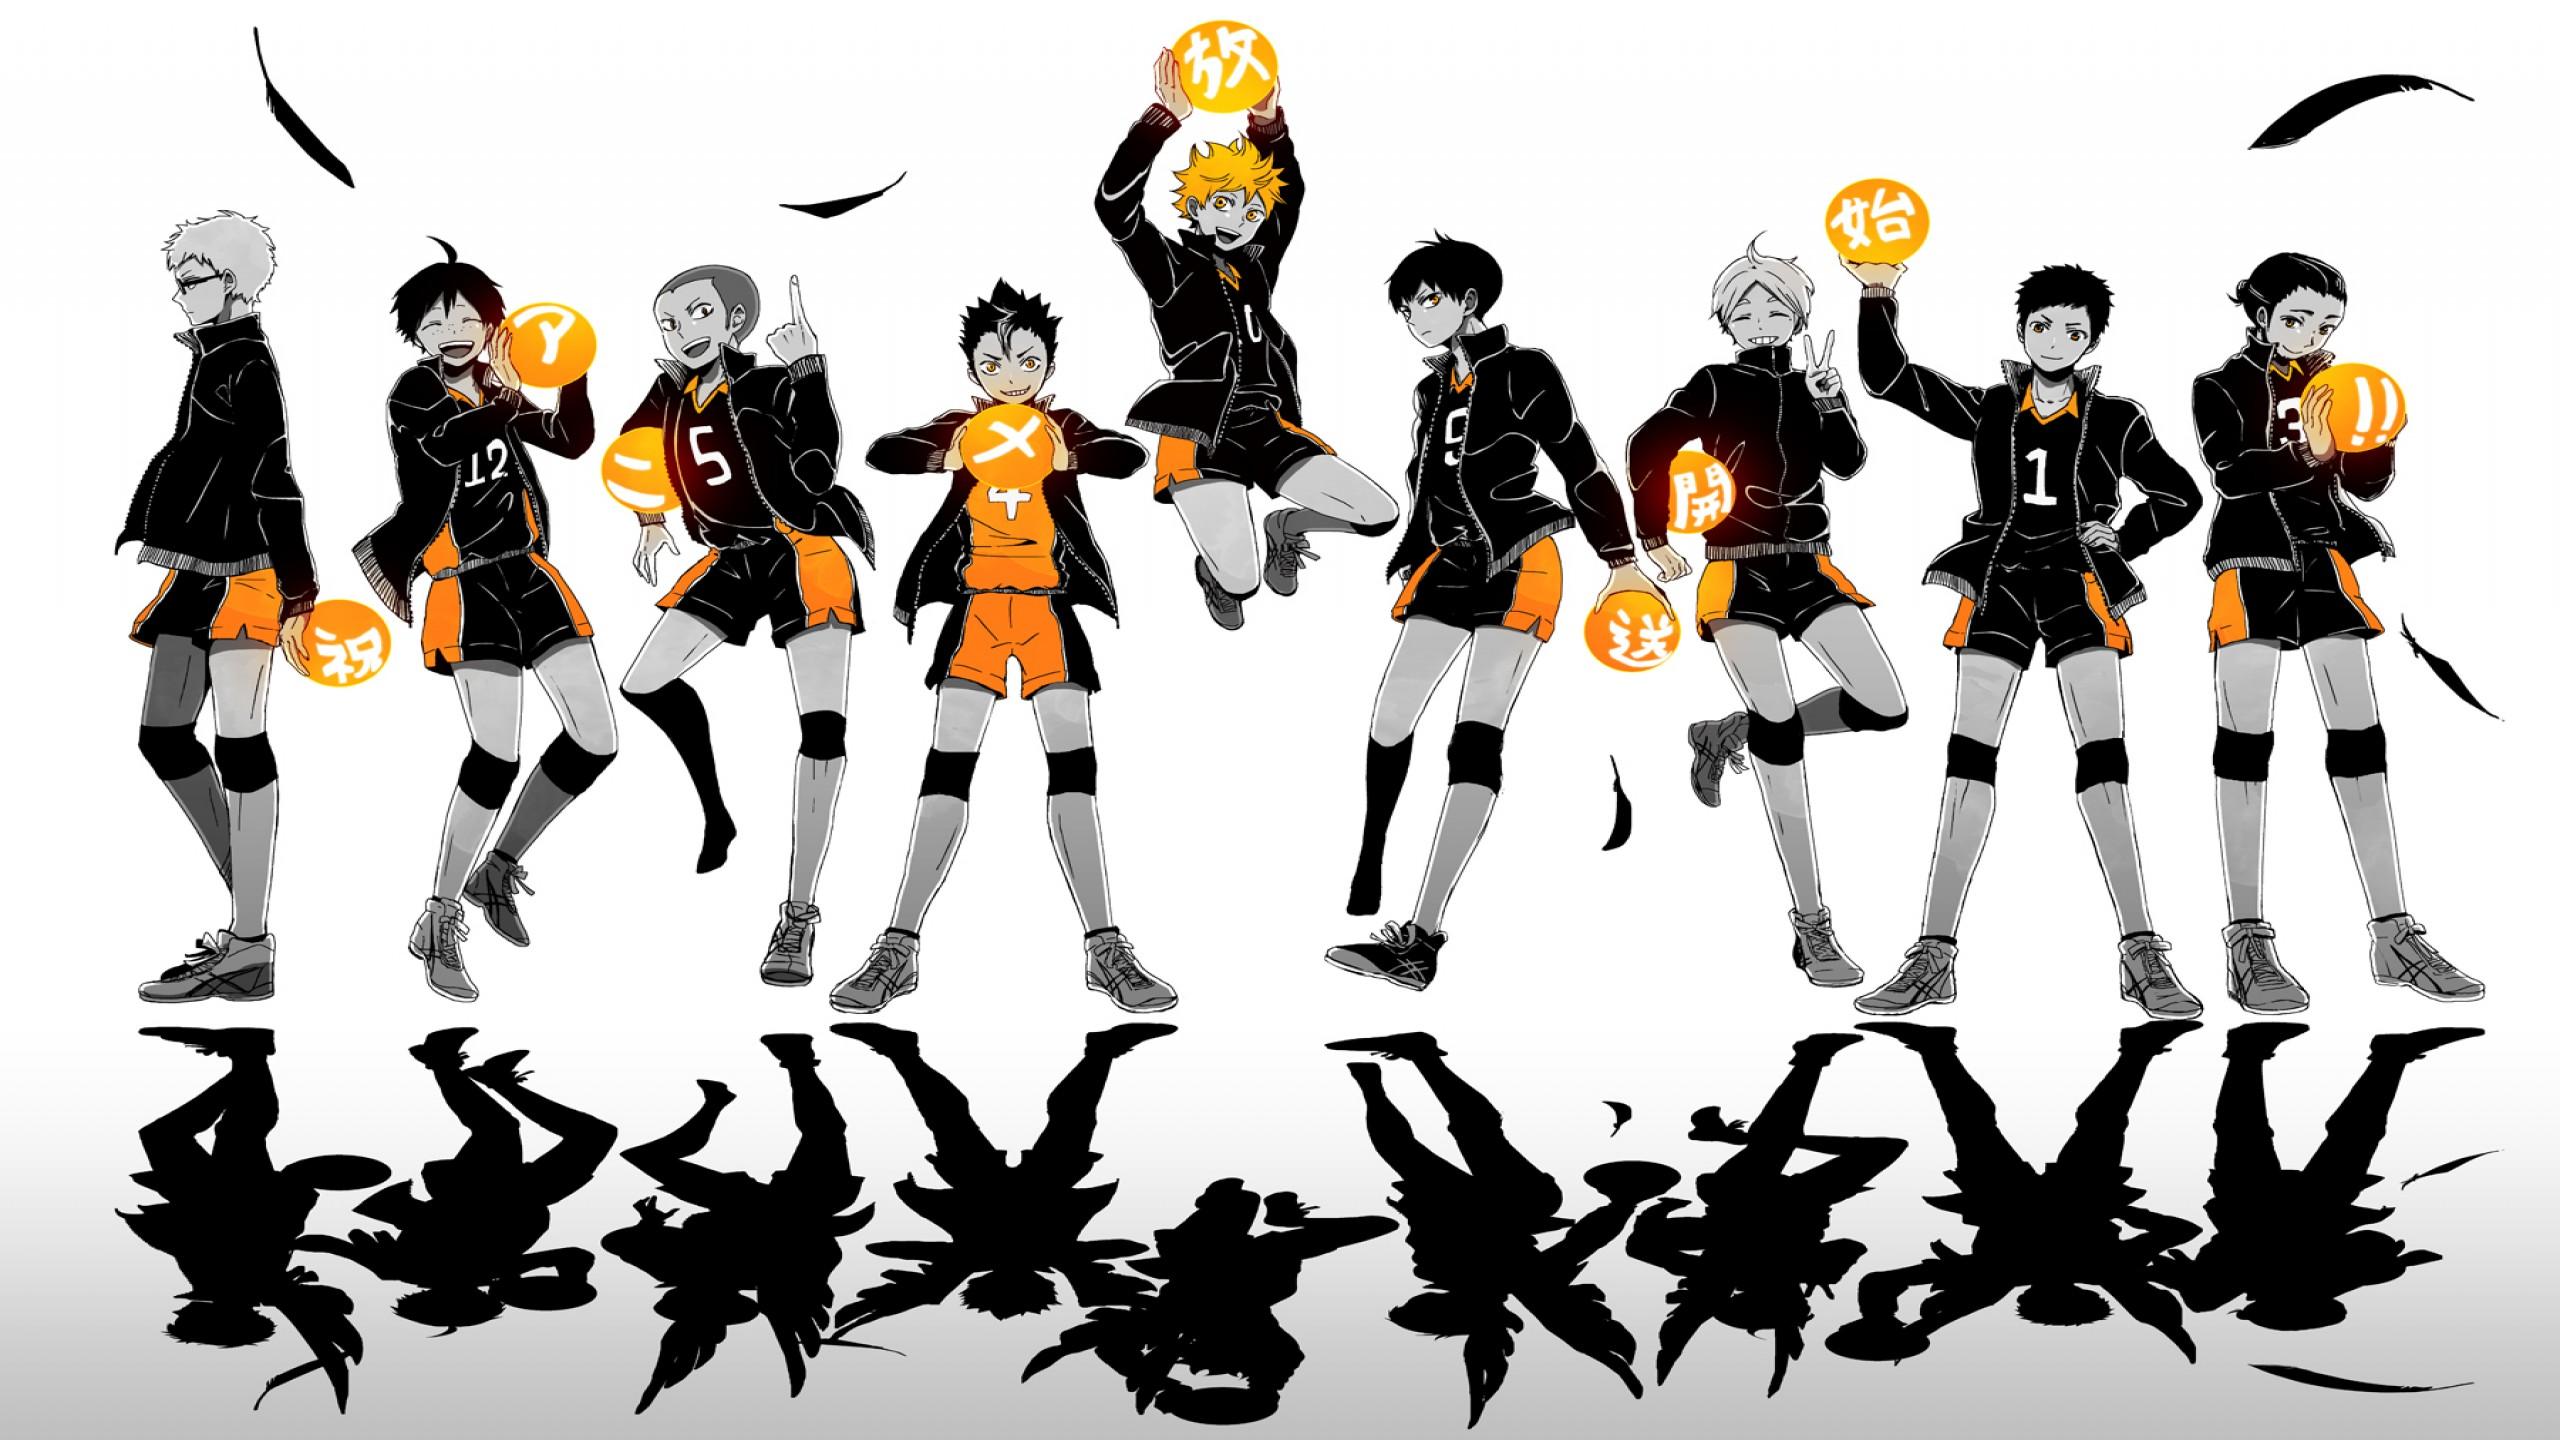 Haikyuu 1915794747 2560x1440   HD Anime Wallpapers 2560x1440